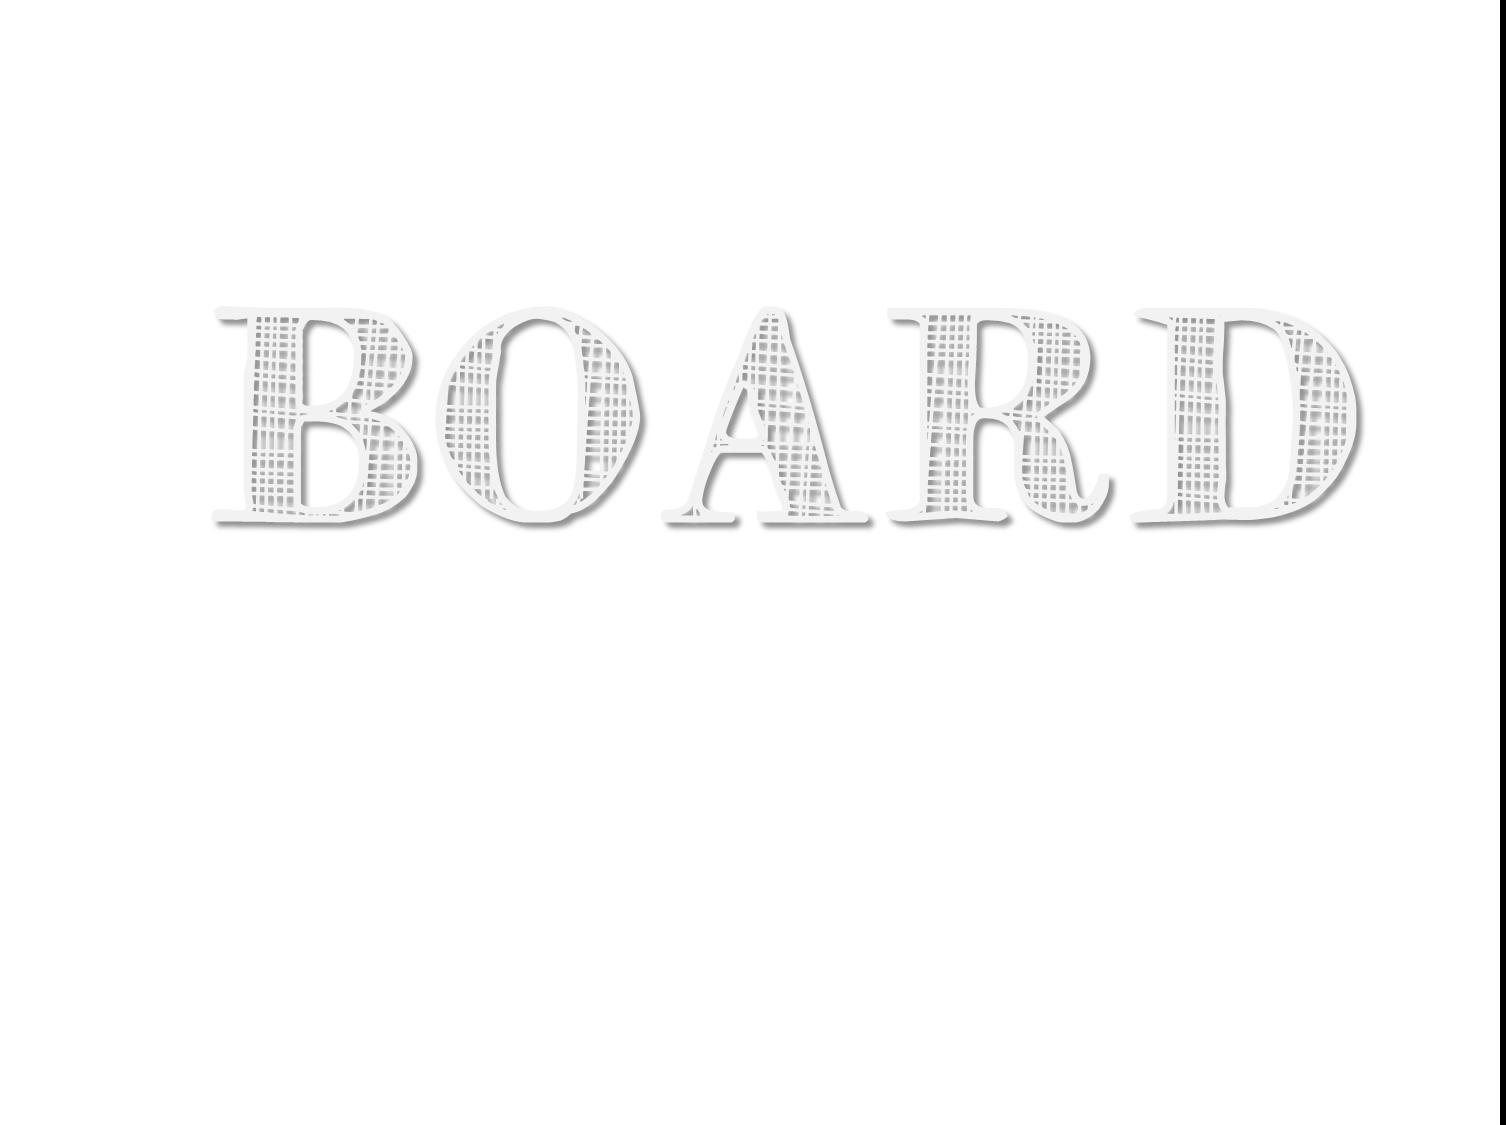 board gray.png